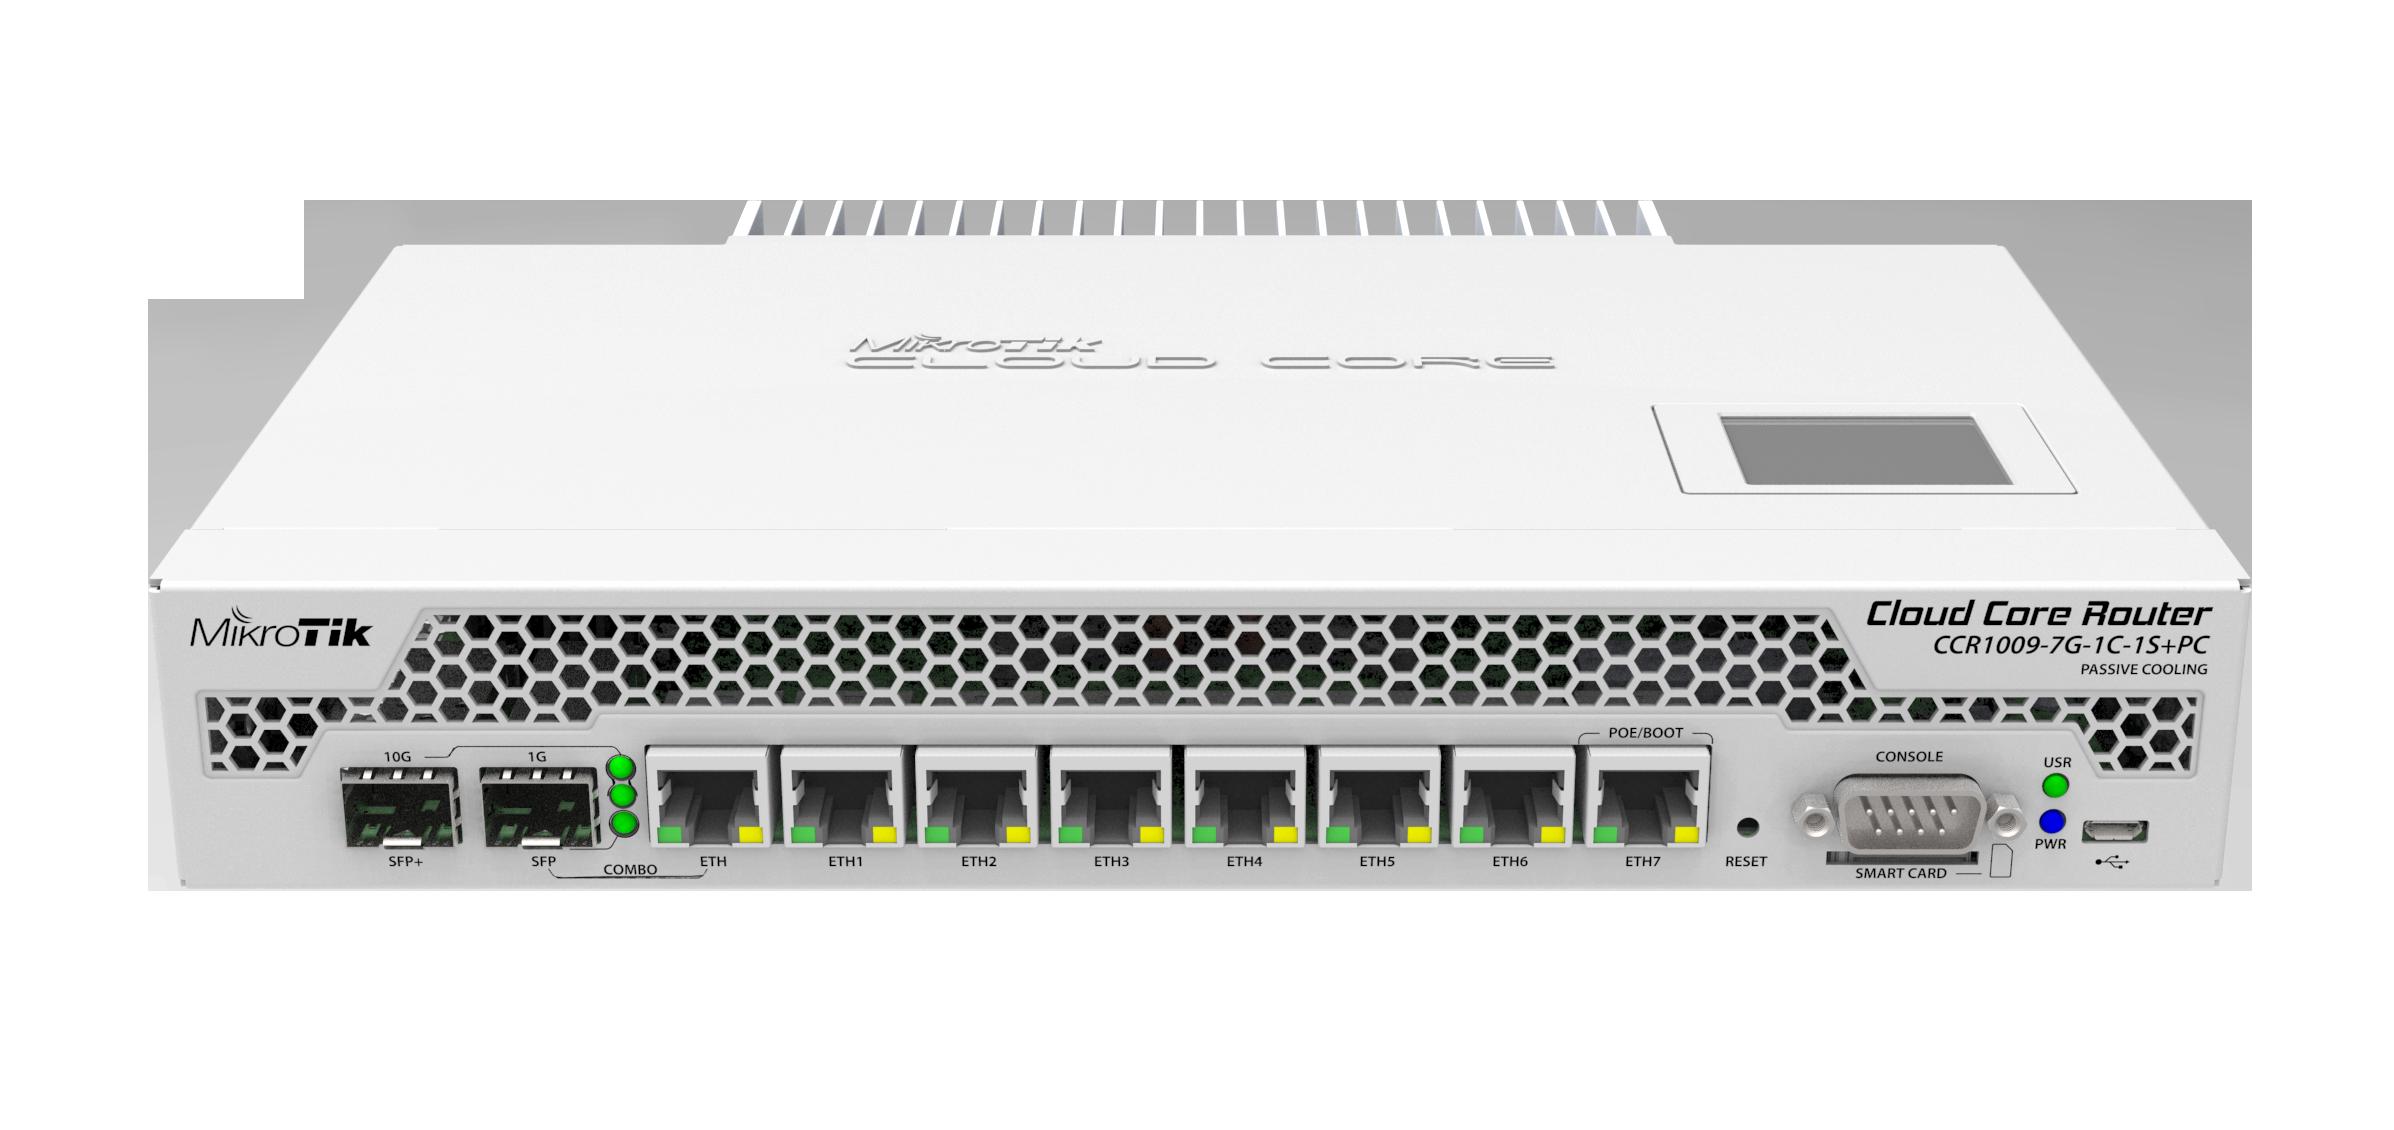 CCR1009-7G-1C-1SplusPC Cloud Core Router 1009-7G-1C-1S+PC 1x Combo Port, 7xGbit LAN , 1xSFP+ 10Gbit, LCD, L6